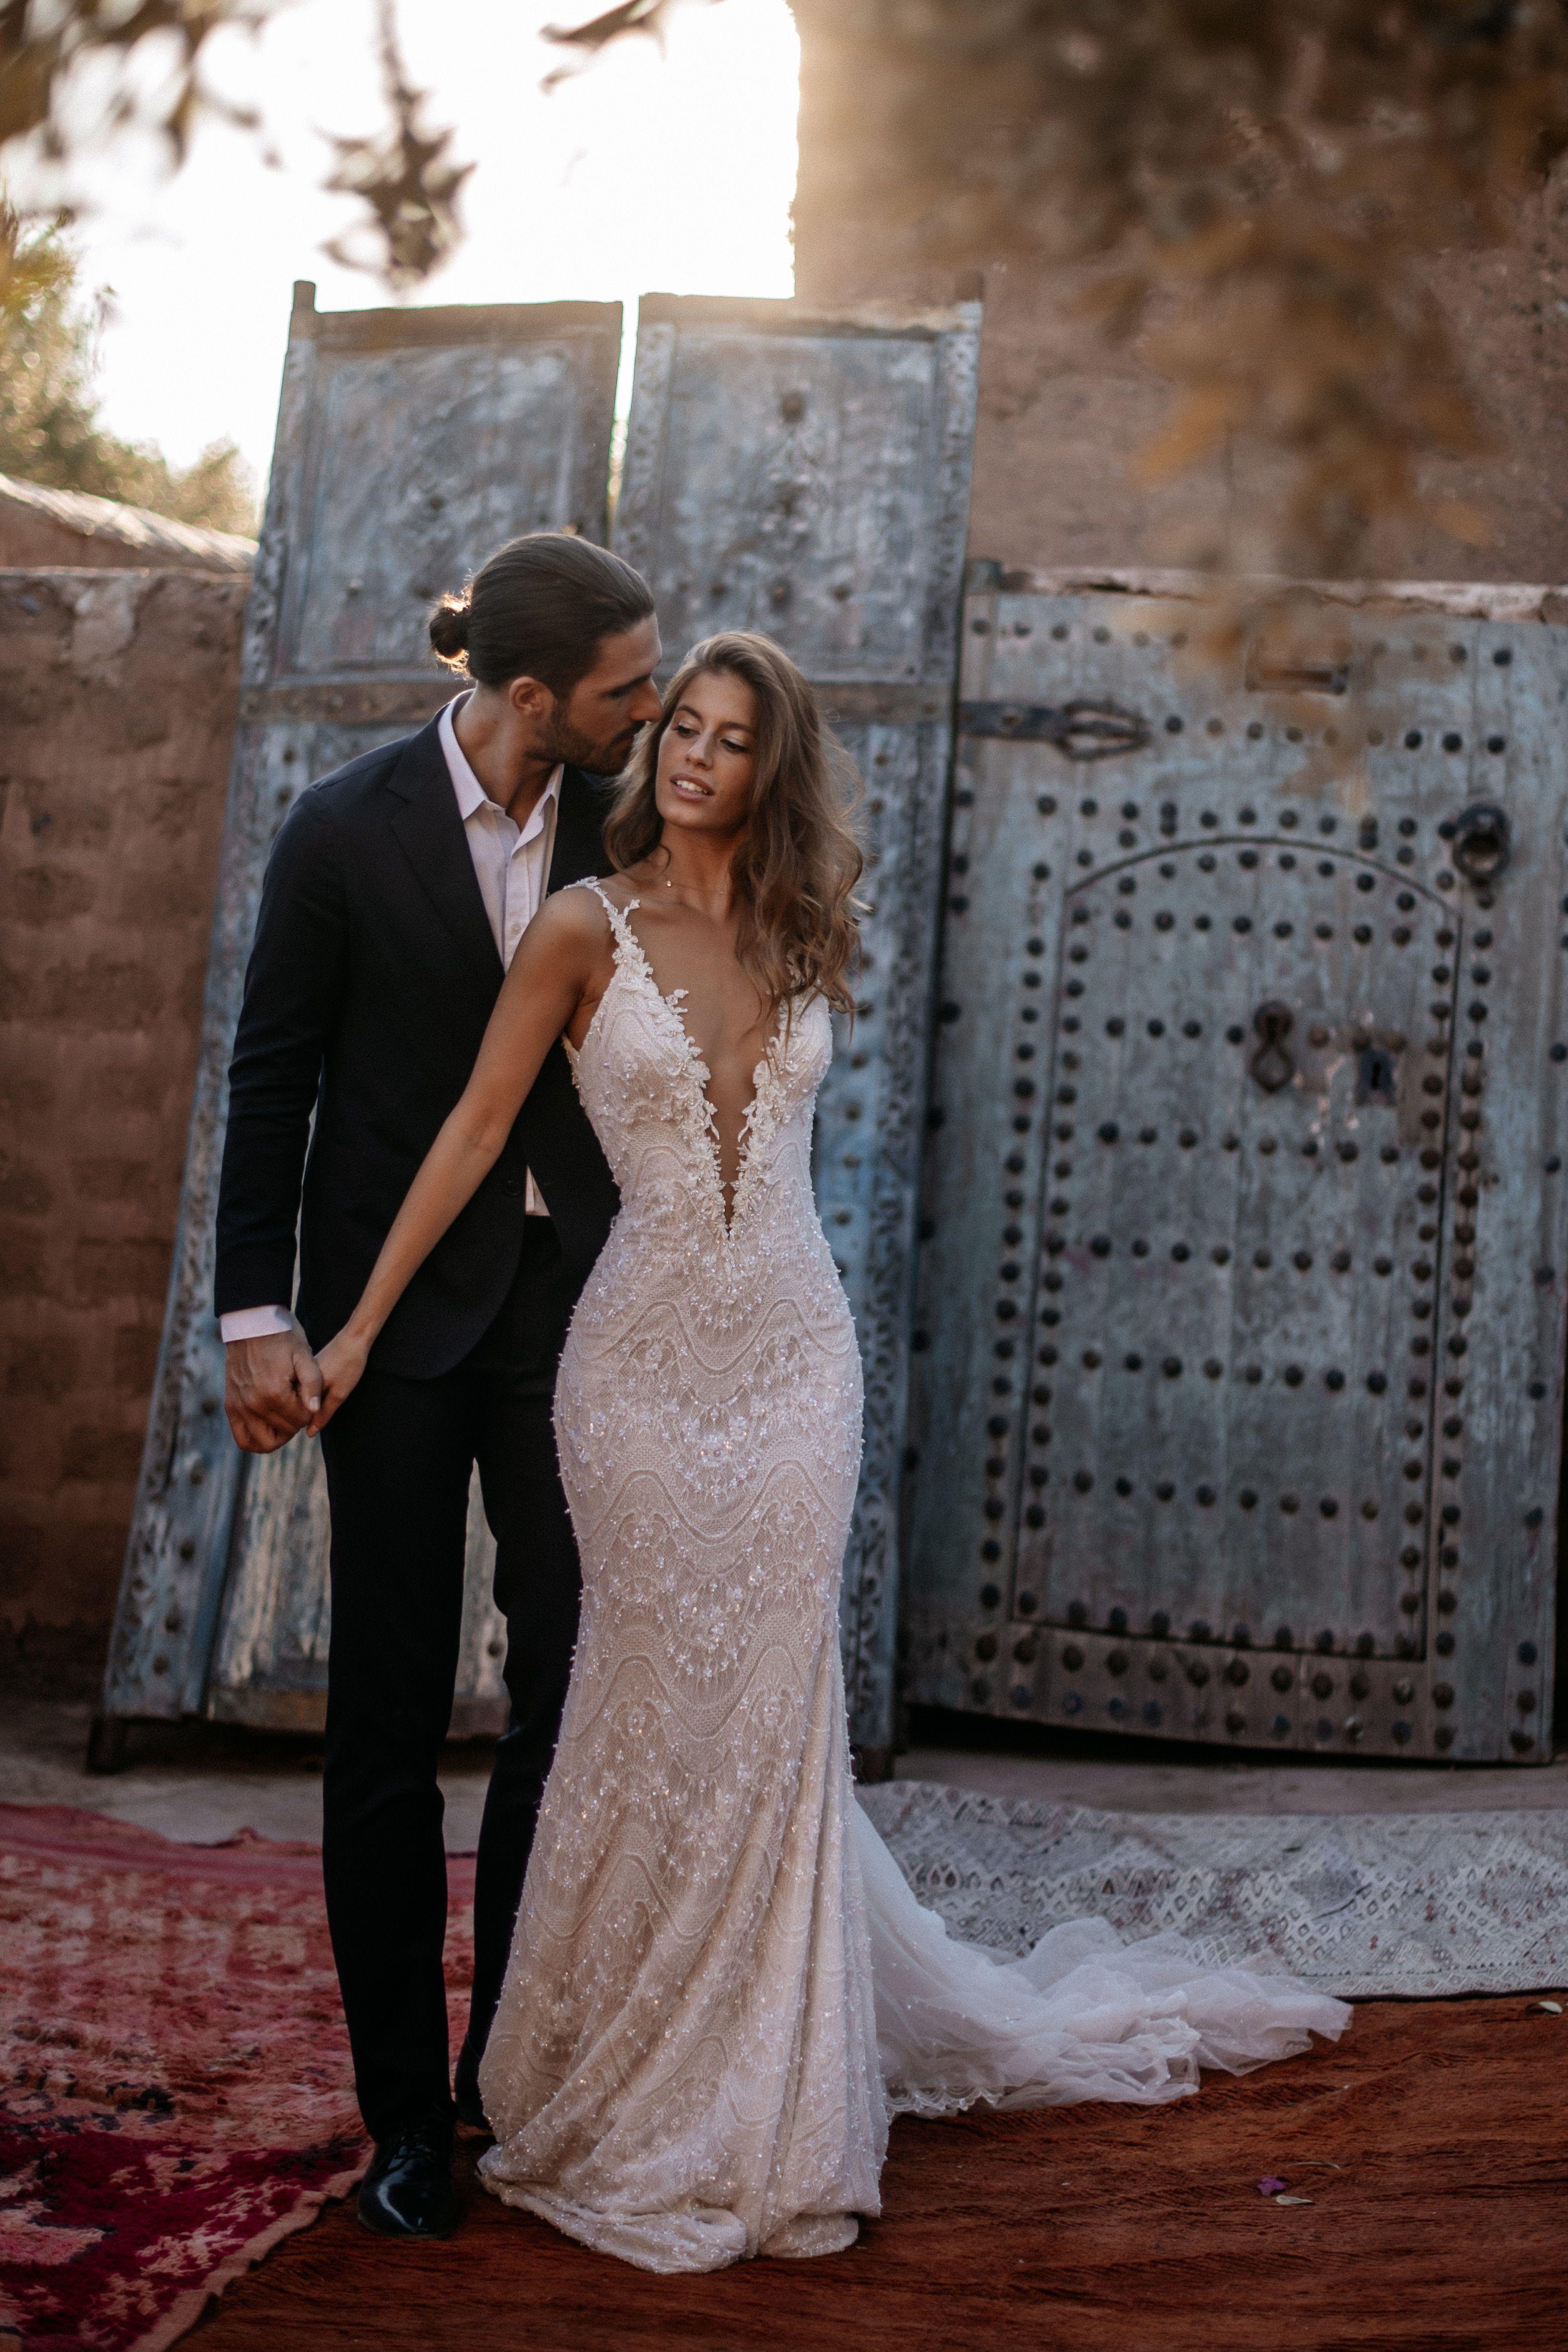 Amani Alegria Bridal Dresses Galia Lahav Wedding Dress Low Back Dream Wedding Dress Lace Wedding Dresses